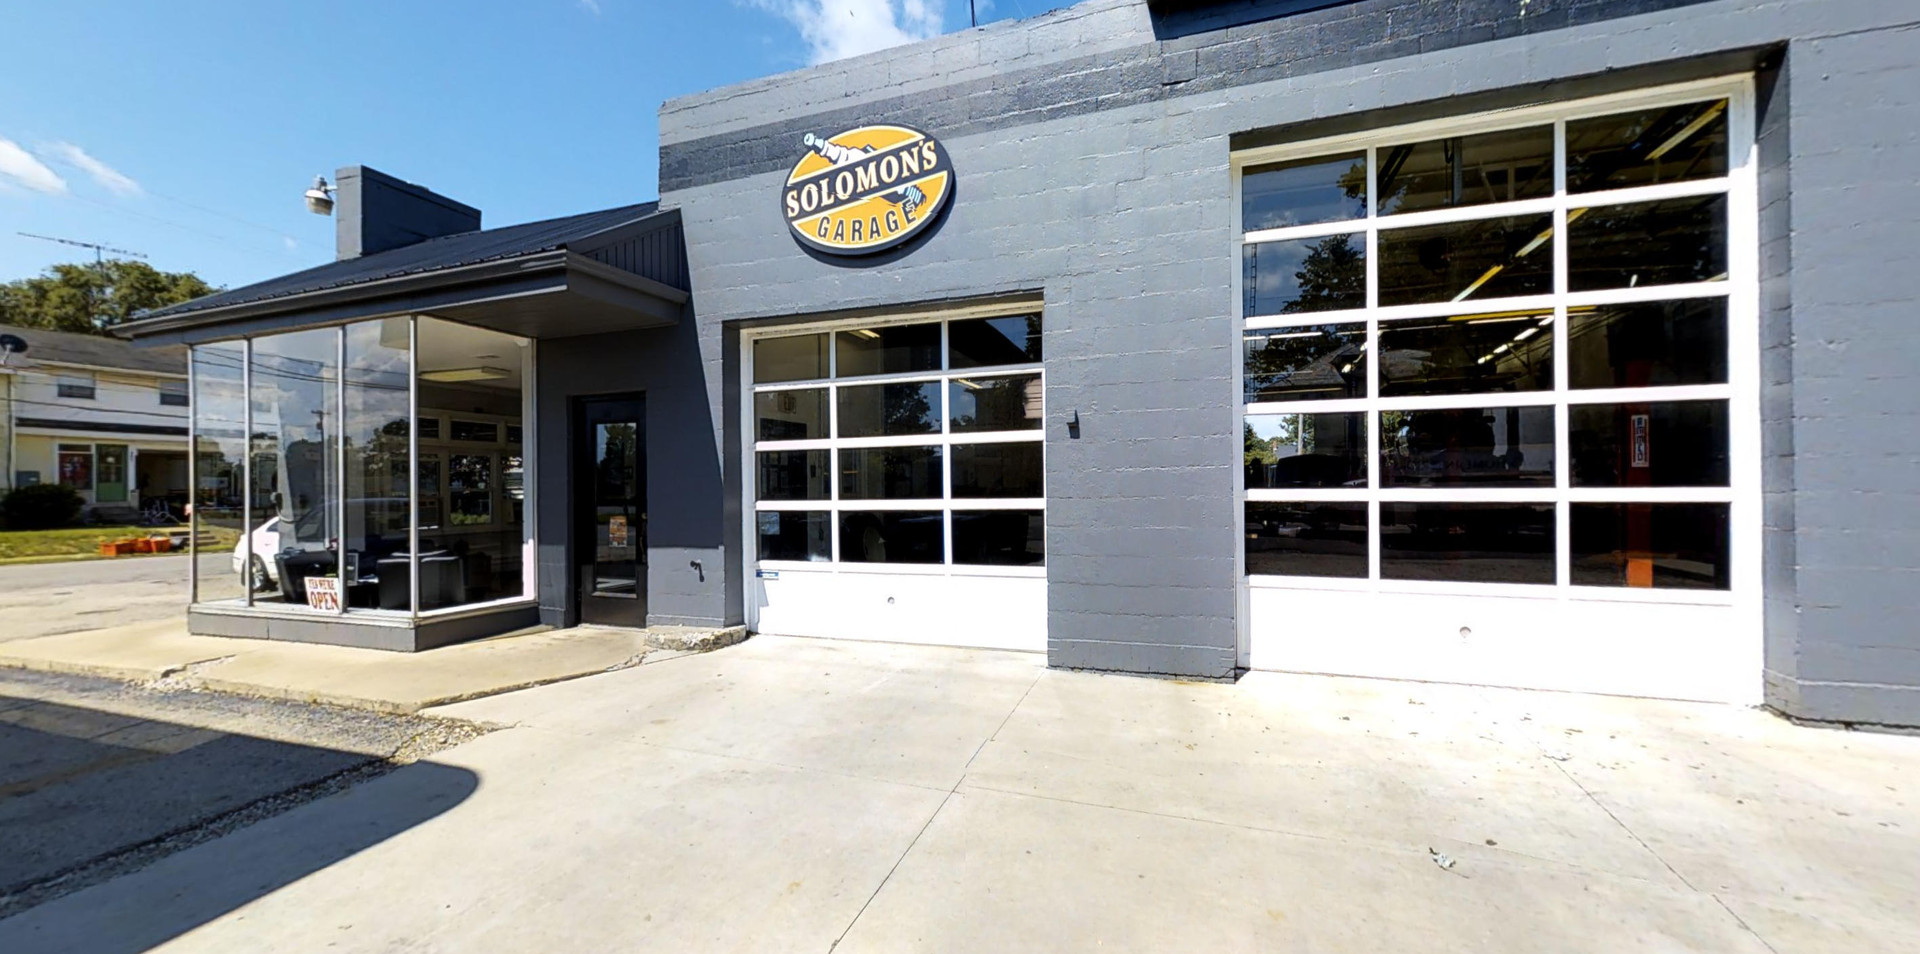 Solomon's Garage